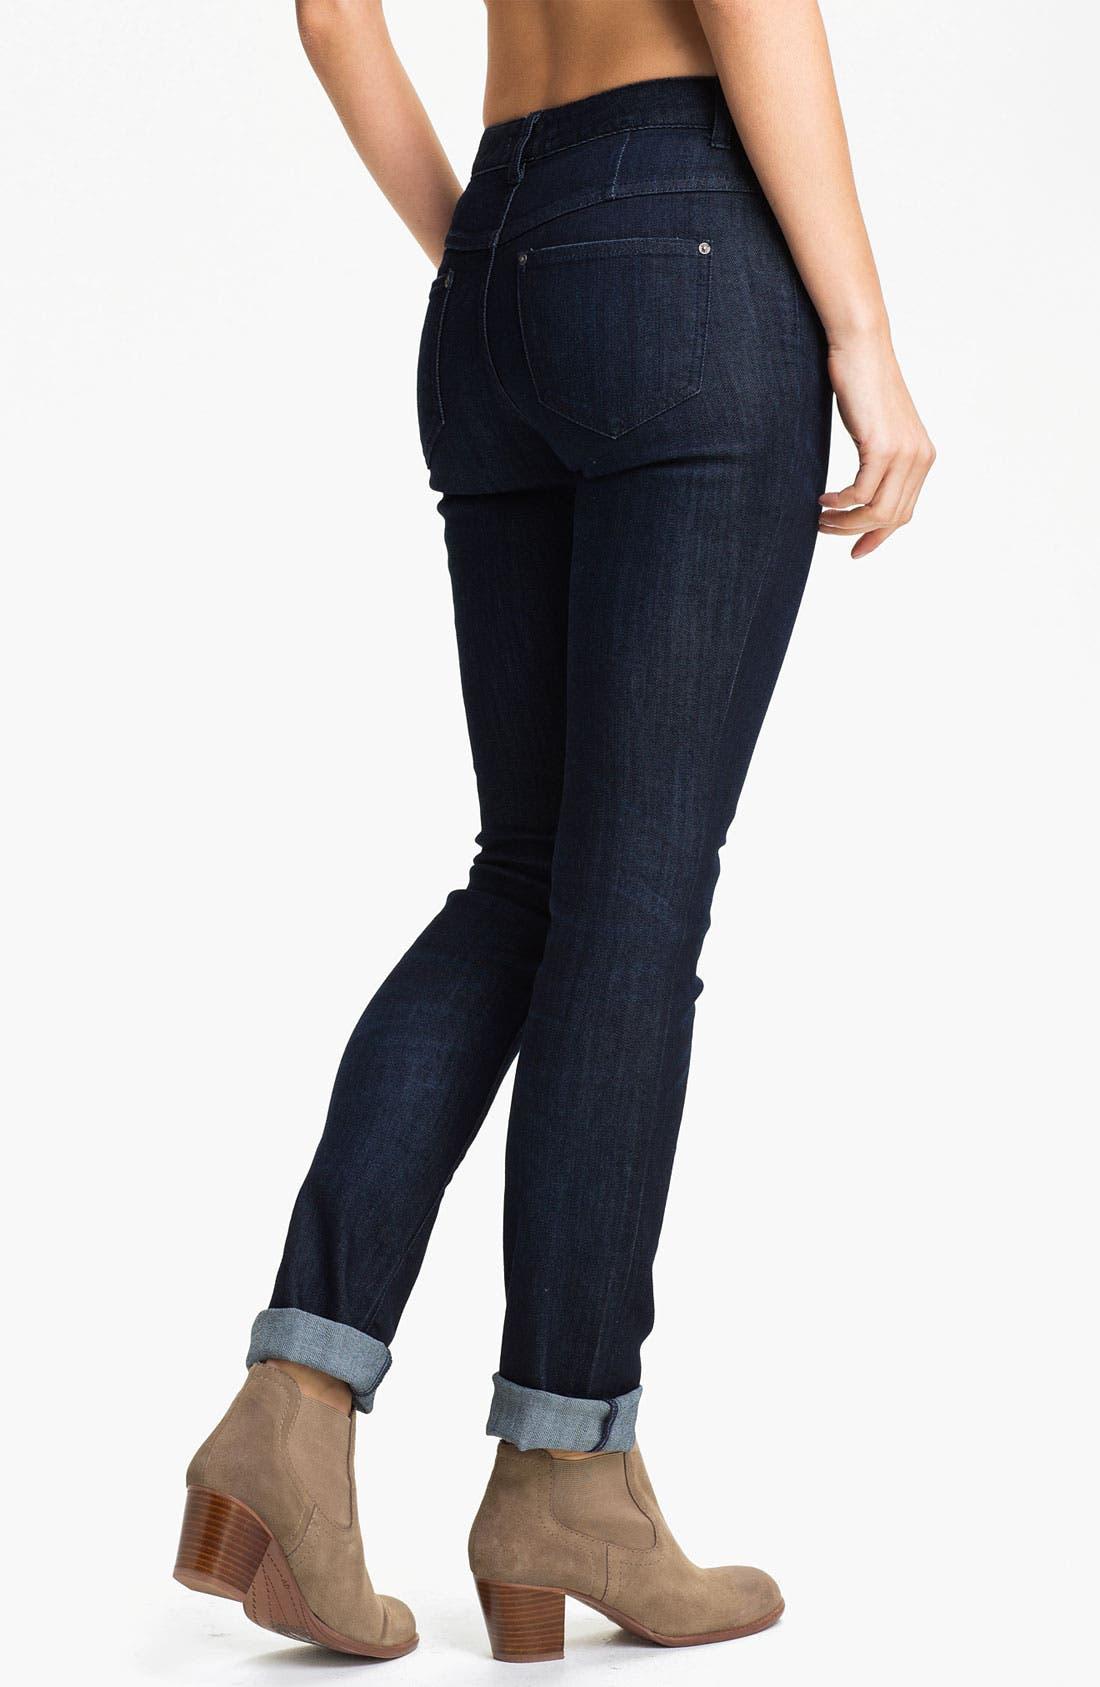 Alternate Image 2  - Free People Stretch Denim Skinny Jeans (Dark Eagle Blue Wash)